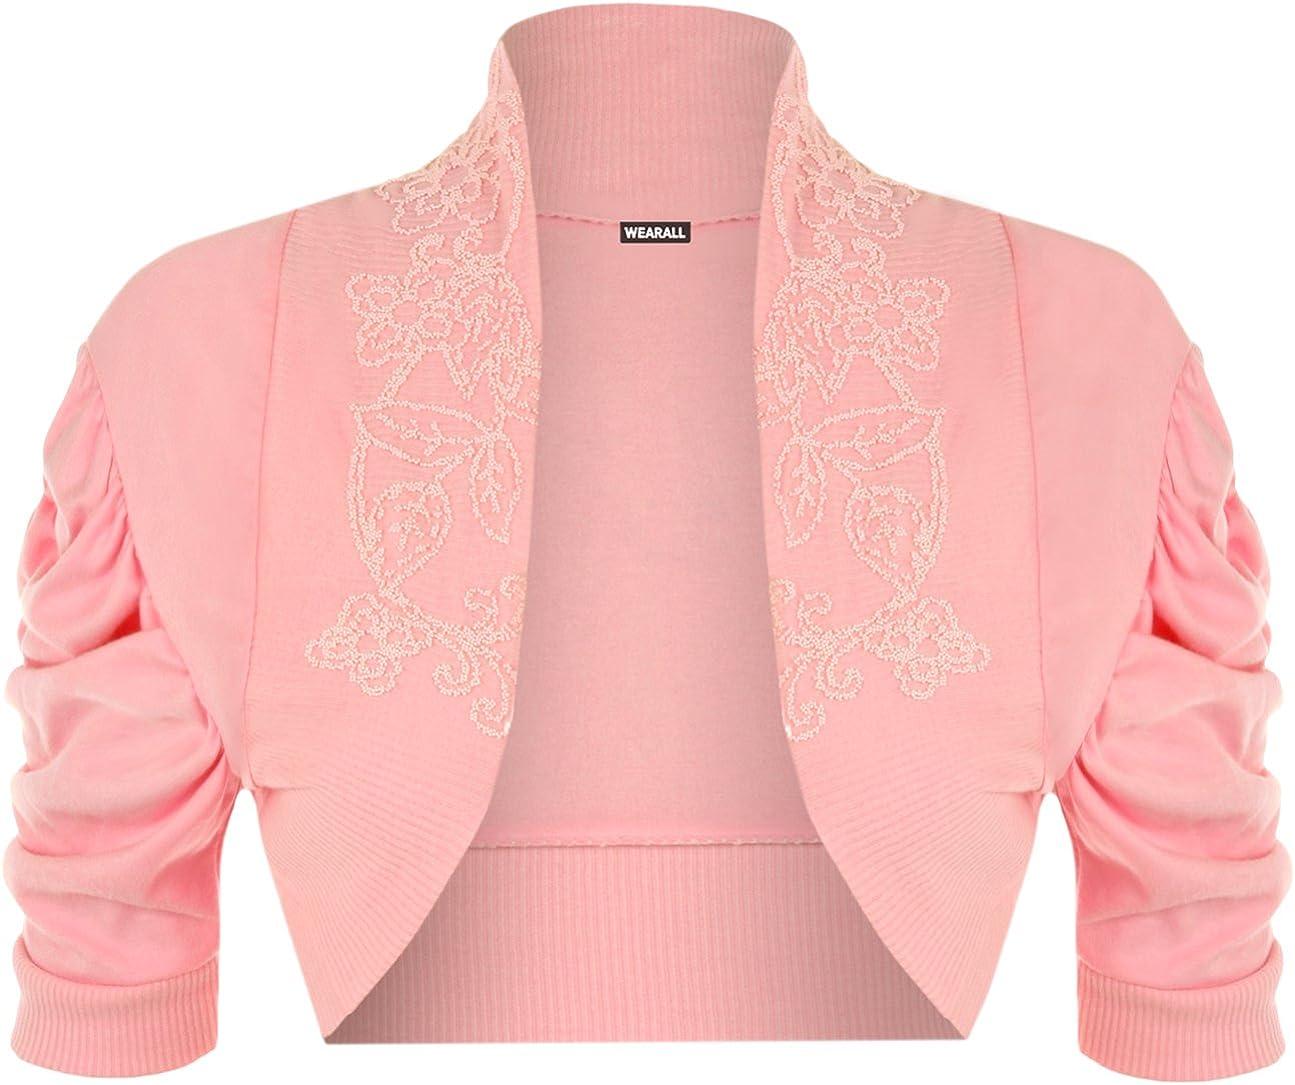 12//14 WearAll Ladies Ruched Shrug Womens Beaded Design Short Sleeve Bolero Cardigan Top Sizes 8//10